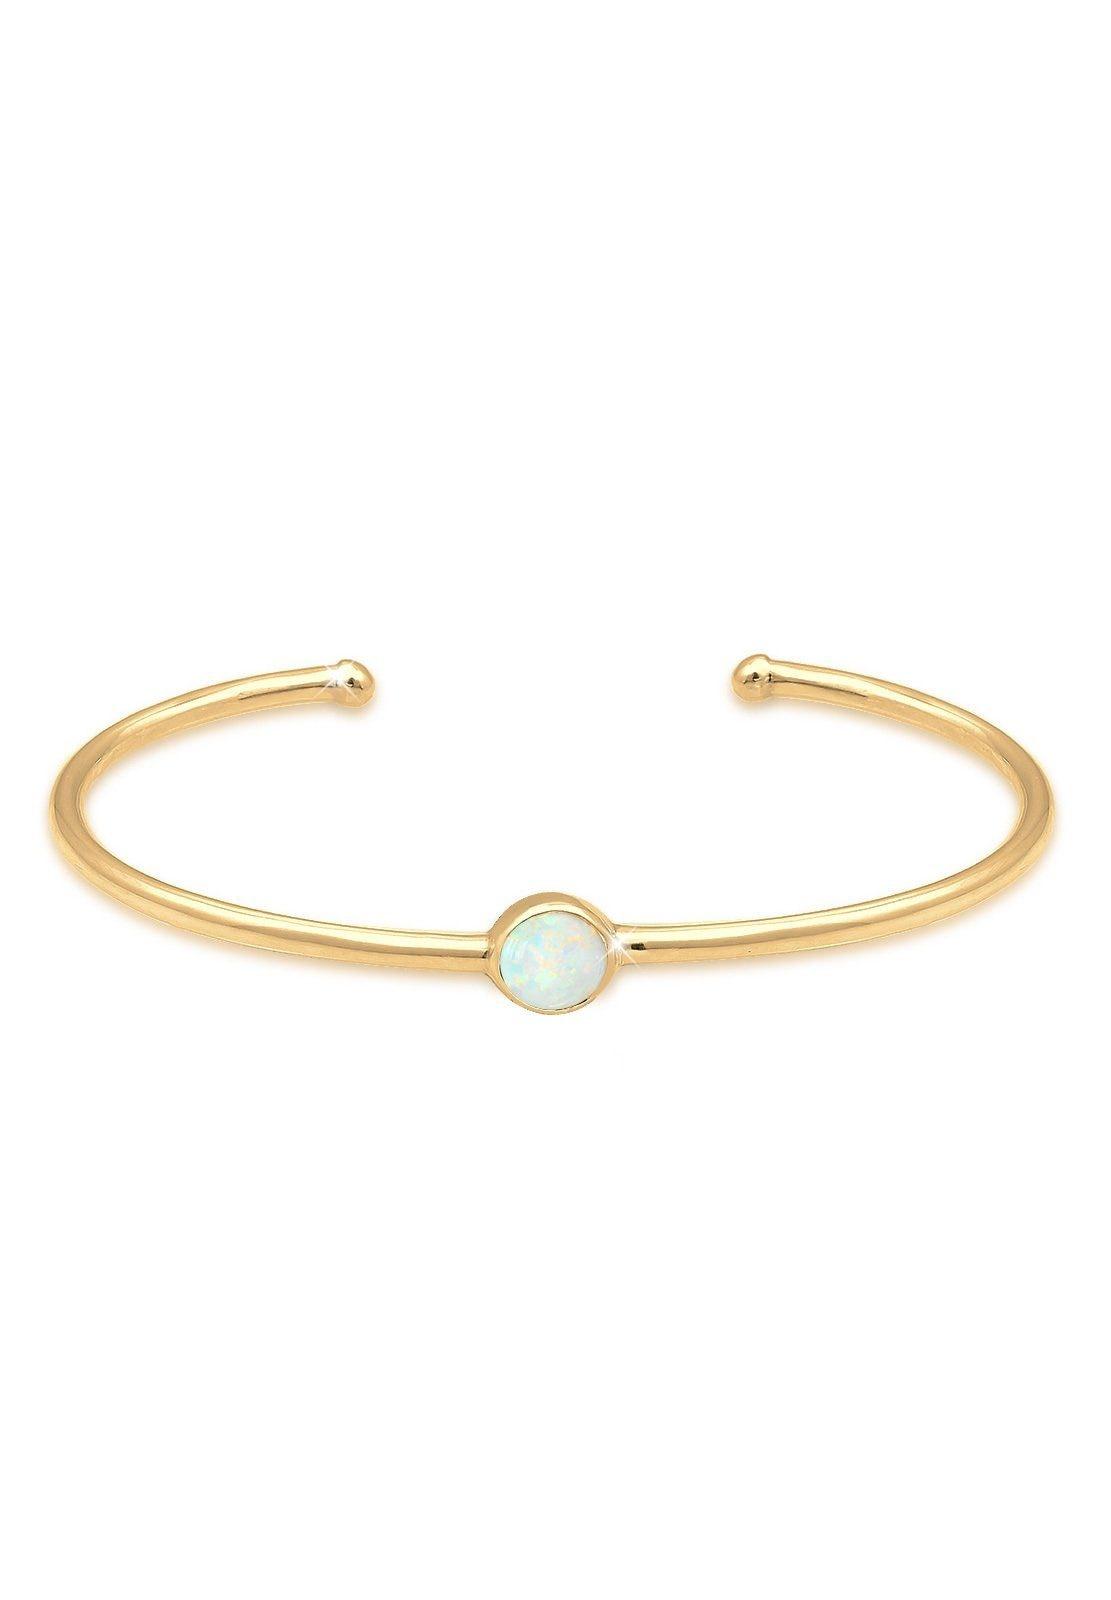 Elli Armreif Armreif Bangle Synthetischer Opal Trend 925 Silber | Schmuck > Armbänder > Armreifen | Elli